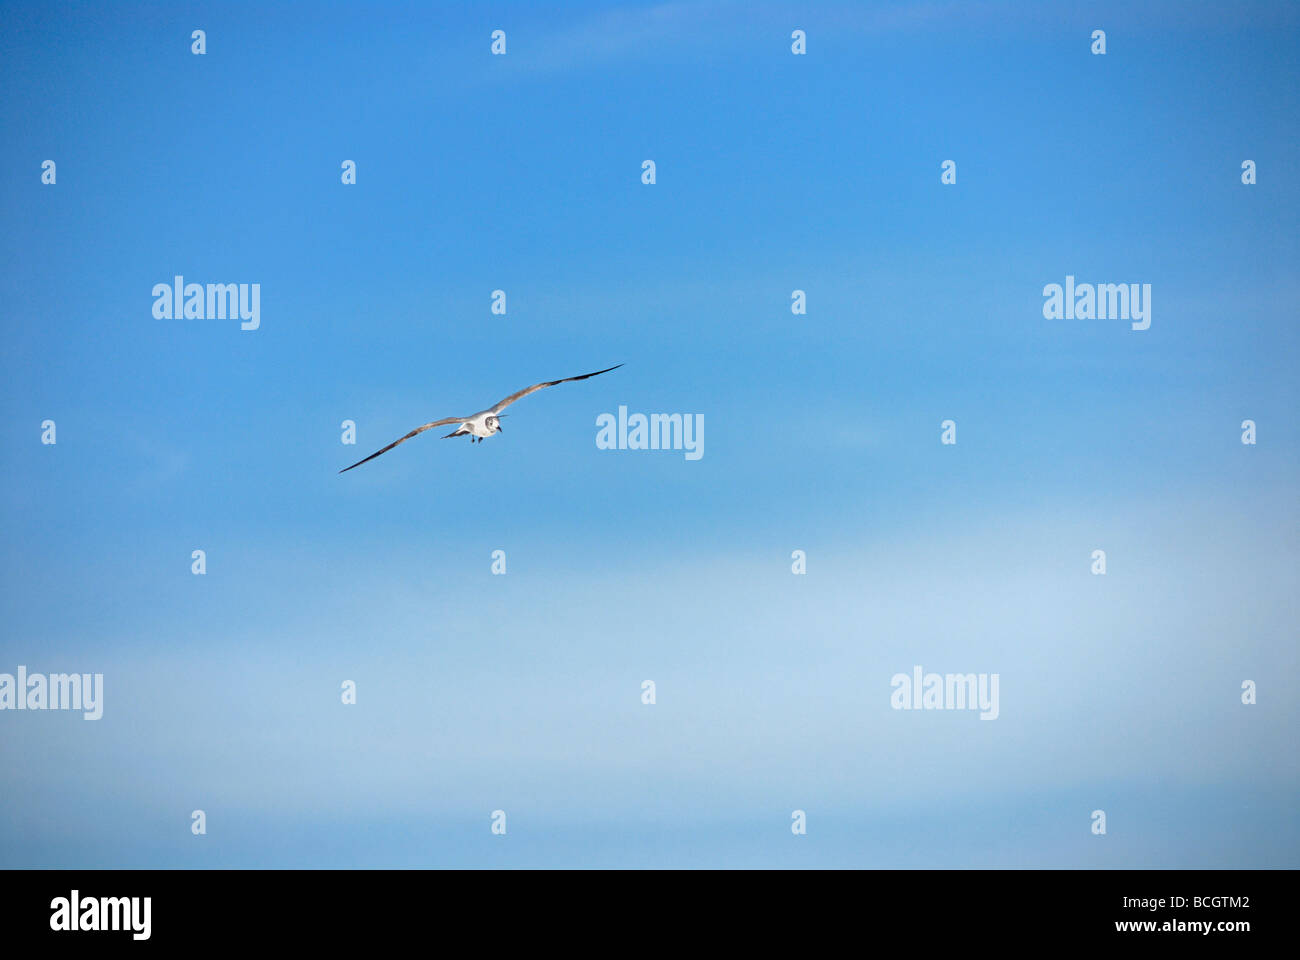 Sea bird in flight - Stock Image